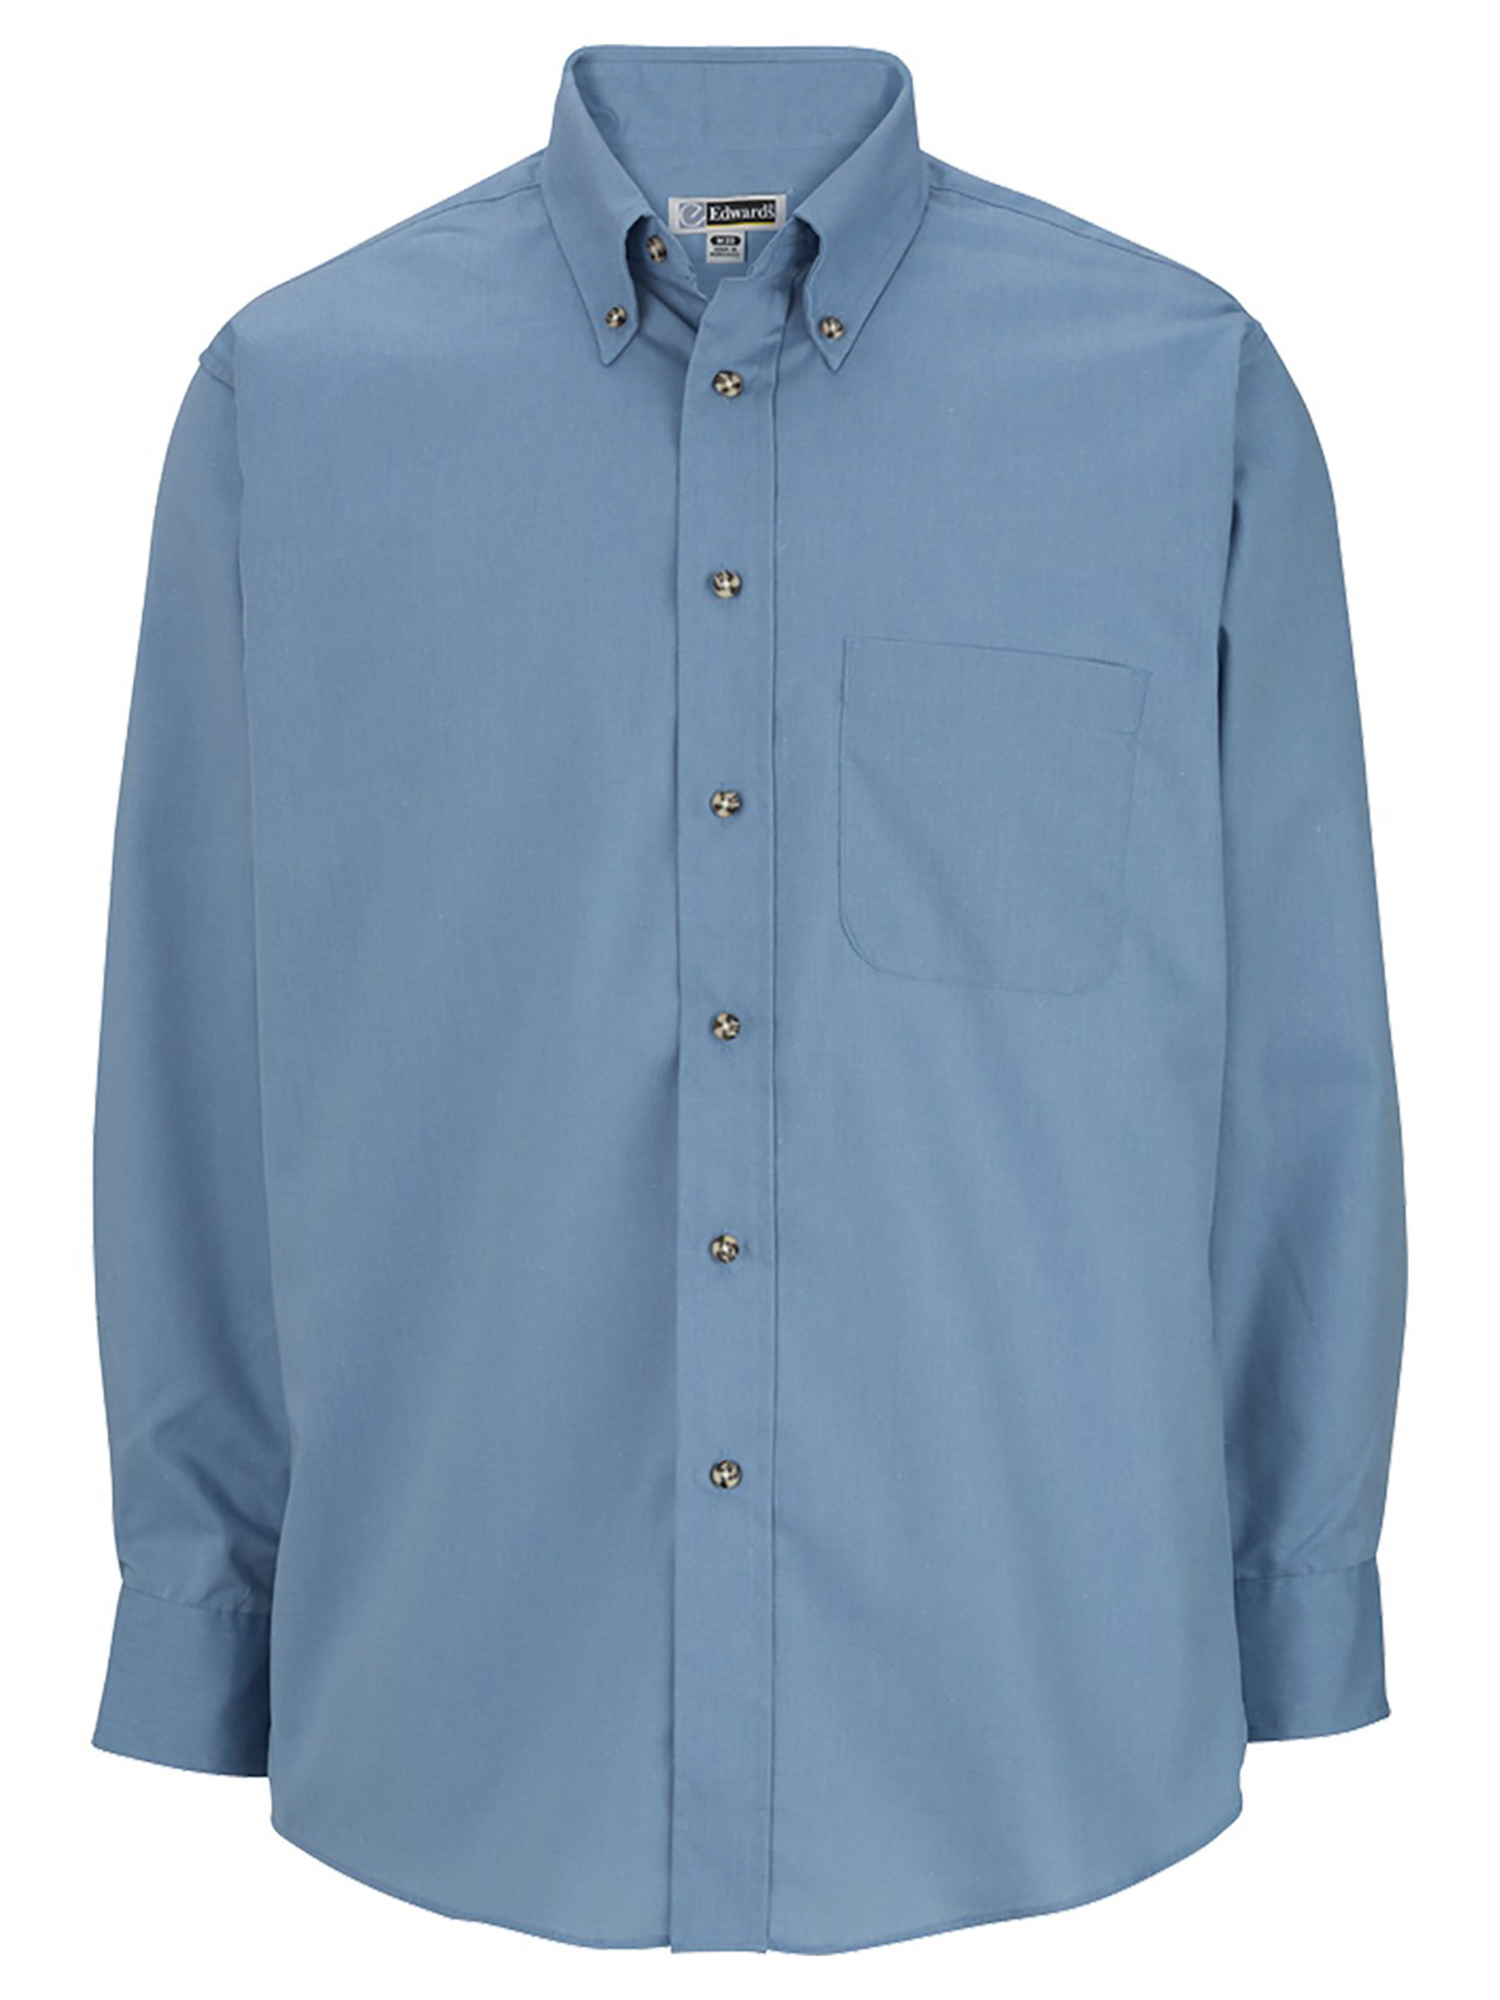 Edwards Garment Mens Long Sleeve Button Down Poplin Shirt/_TEAL/_Small 33